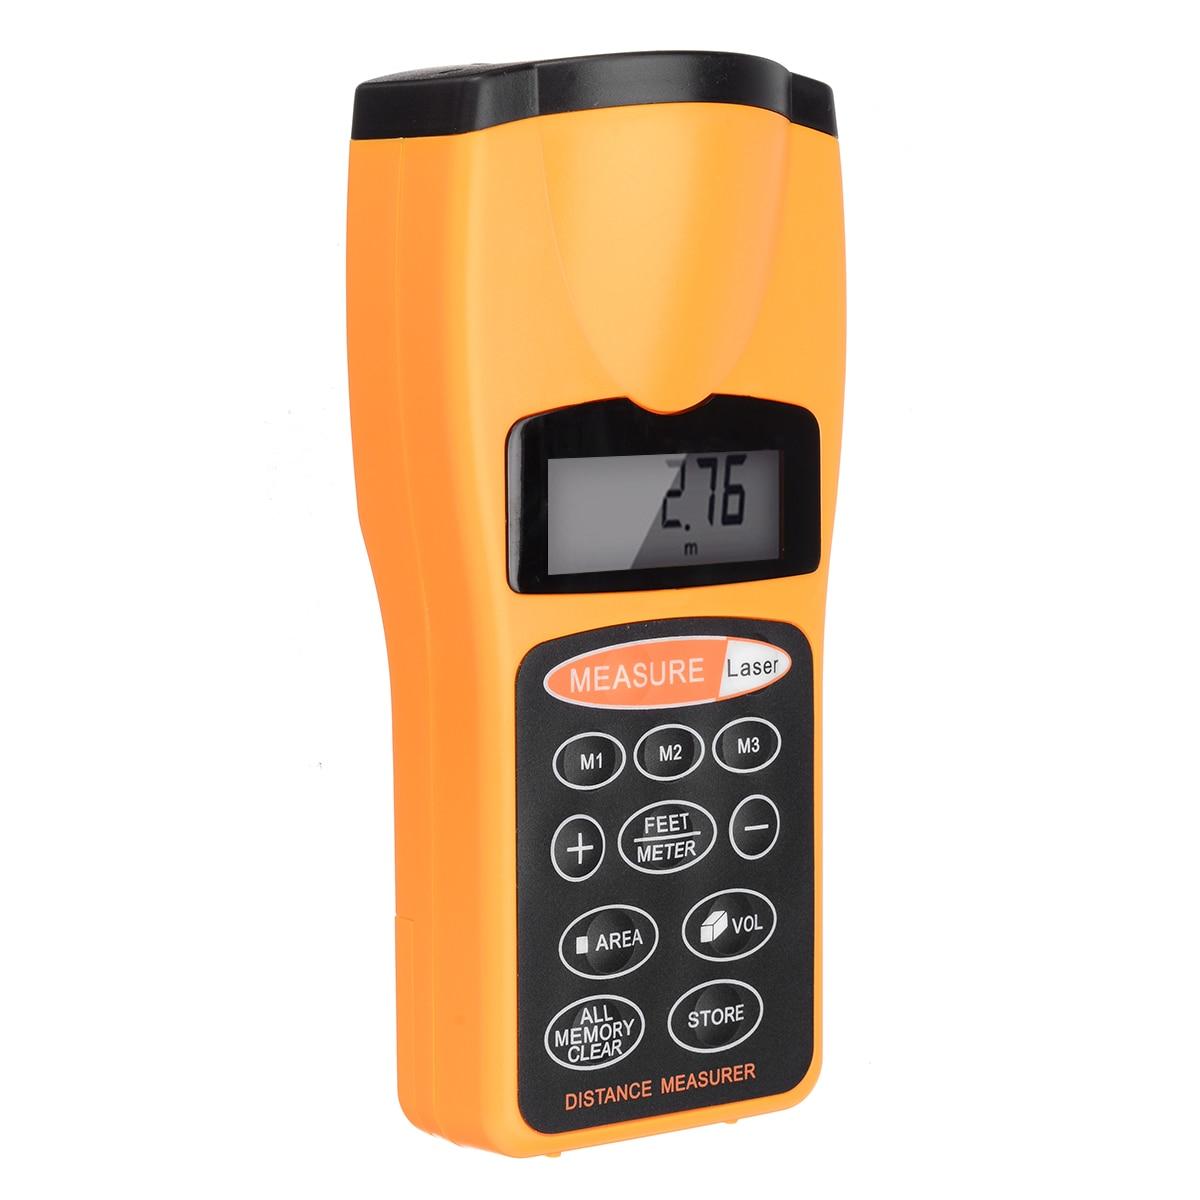 Laser handheld rangefinder medidor de distância eletrônico laser digital faixa de fita localizador fita de medição